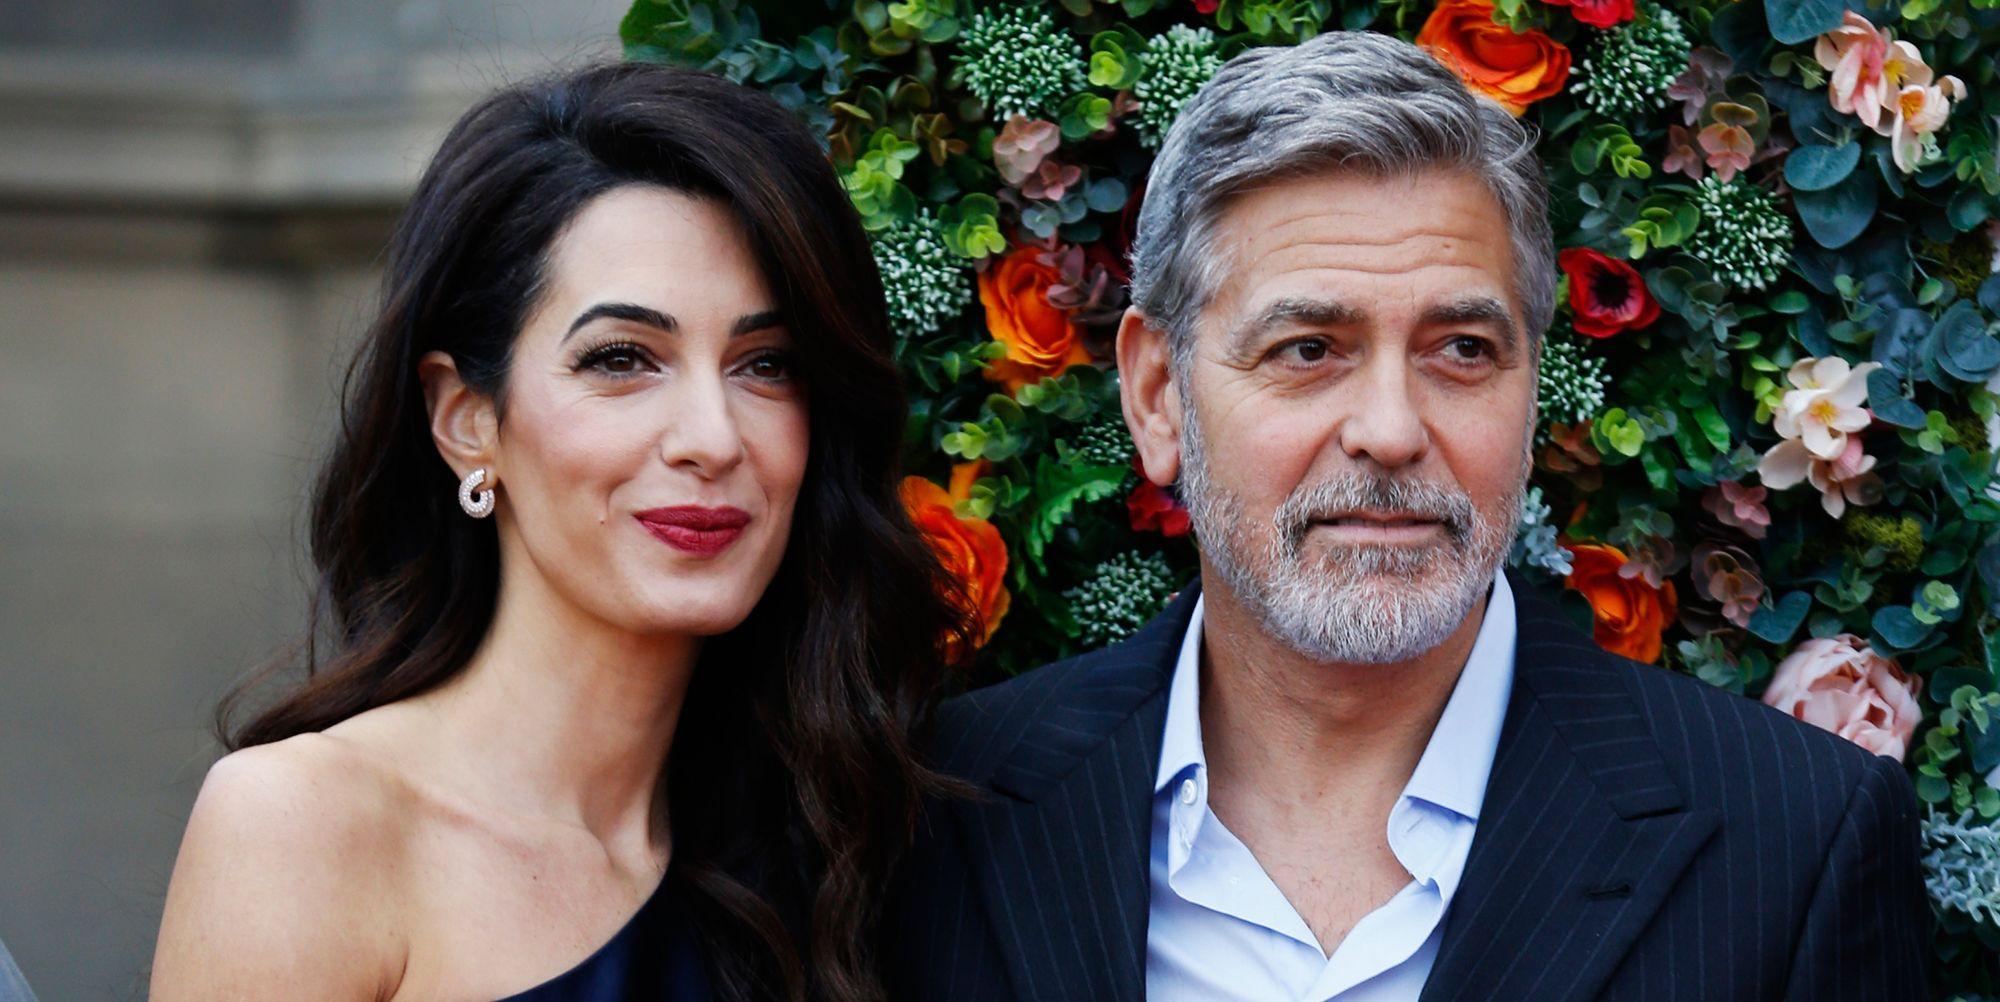 Amal Clooney looks perfect in navy Stella McCartney for charity gala in Edinburgh